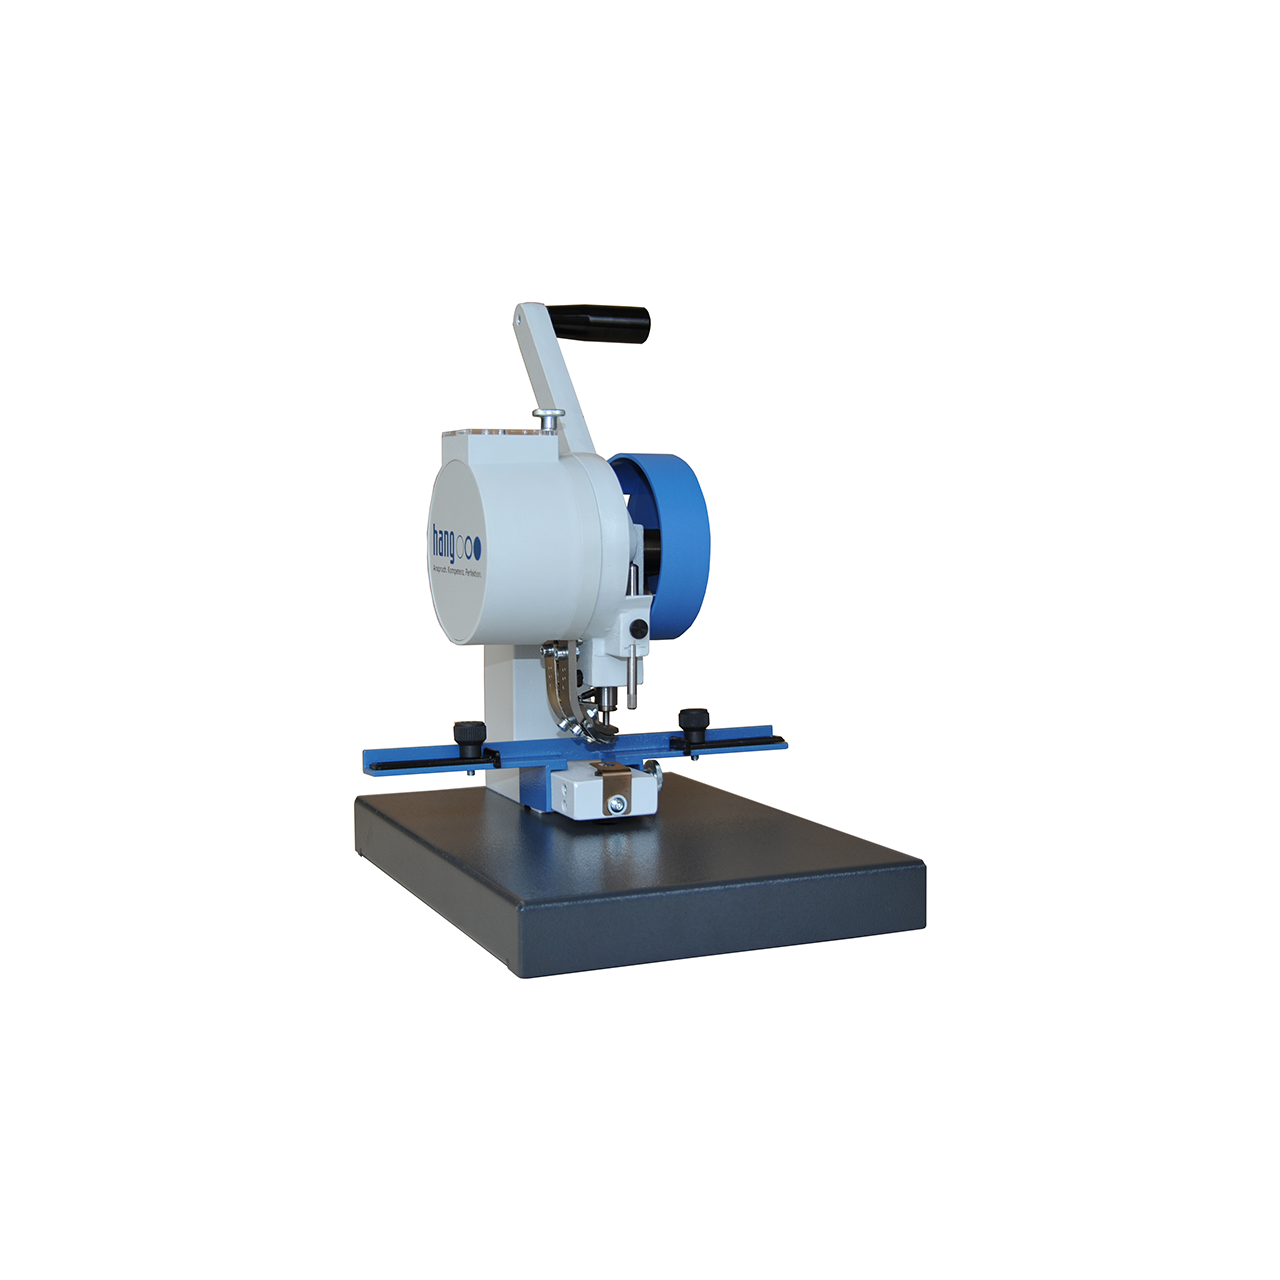 Ösmaschine Hang Piccolo Modell 102-04 Basis